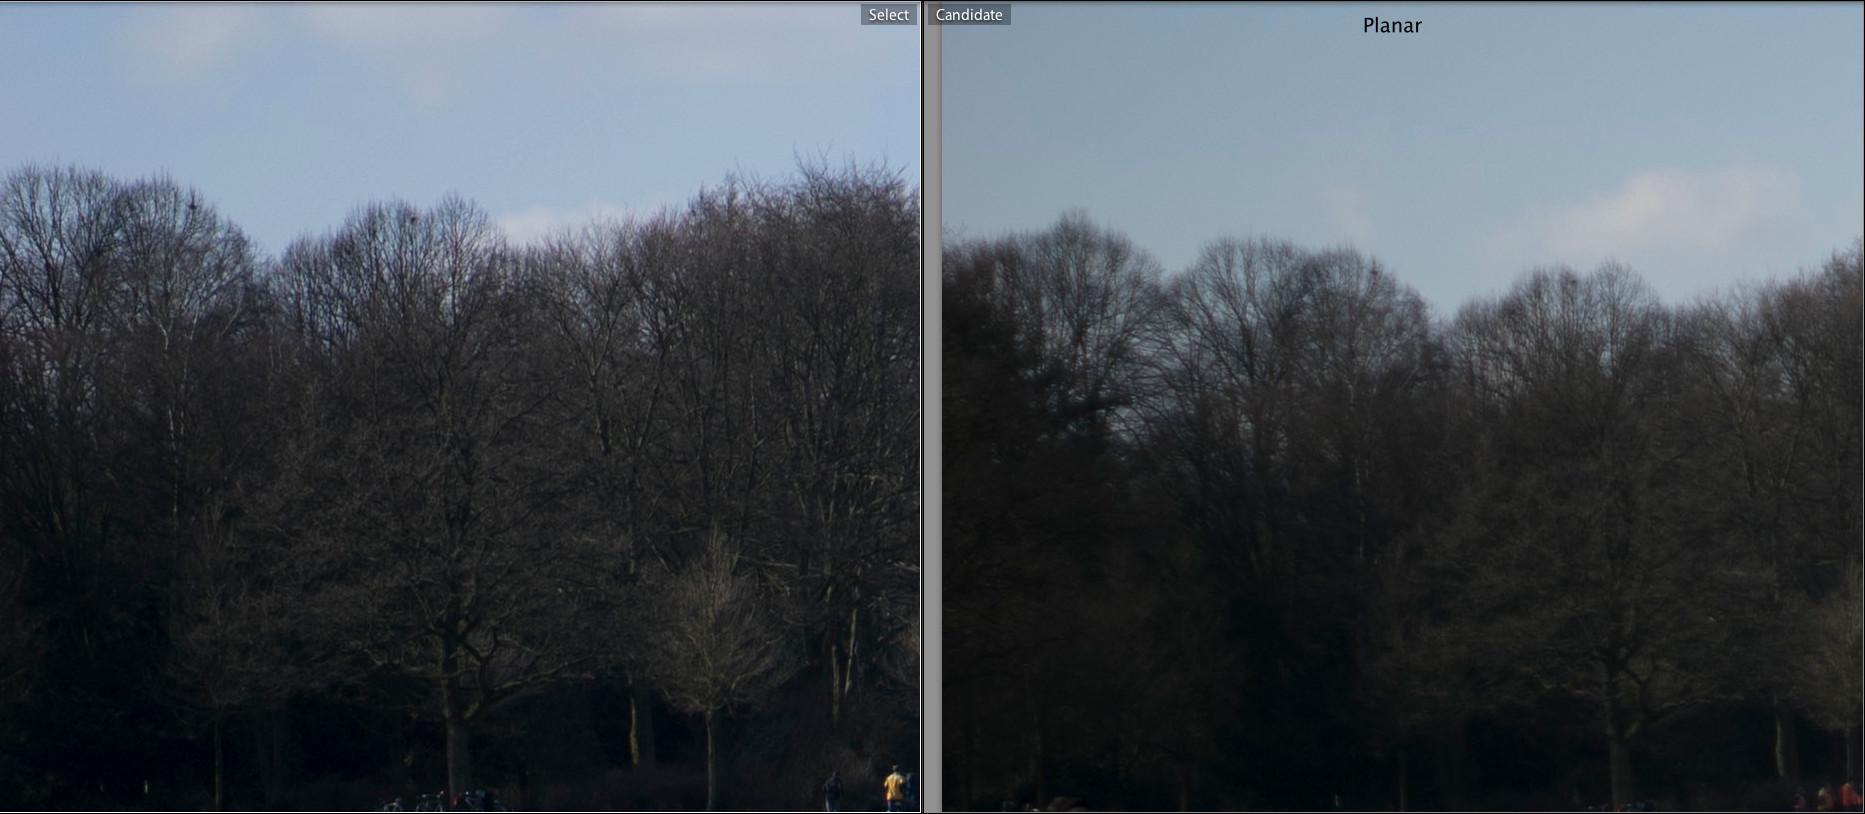 Zeiss Planar T* 2/50 ZM vs  Sony FE 55mm F1 8 ZA Carl Zeiss Sonnar T